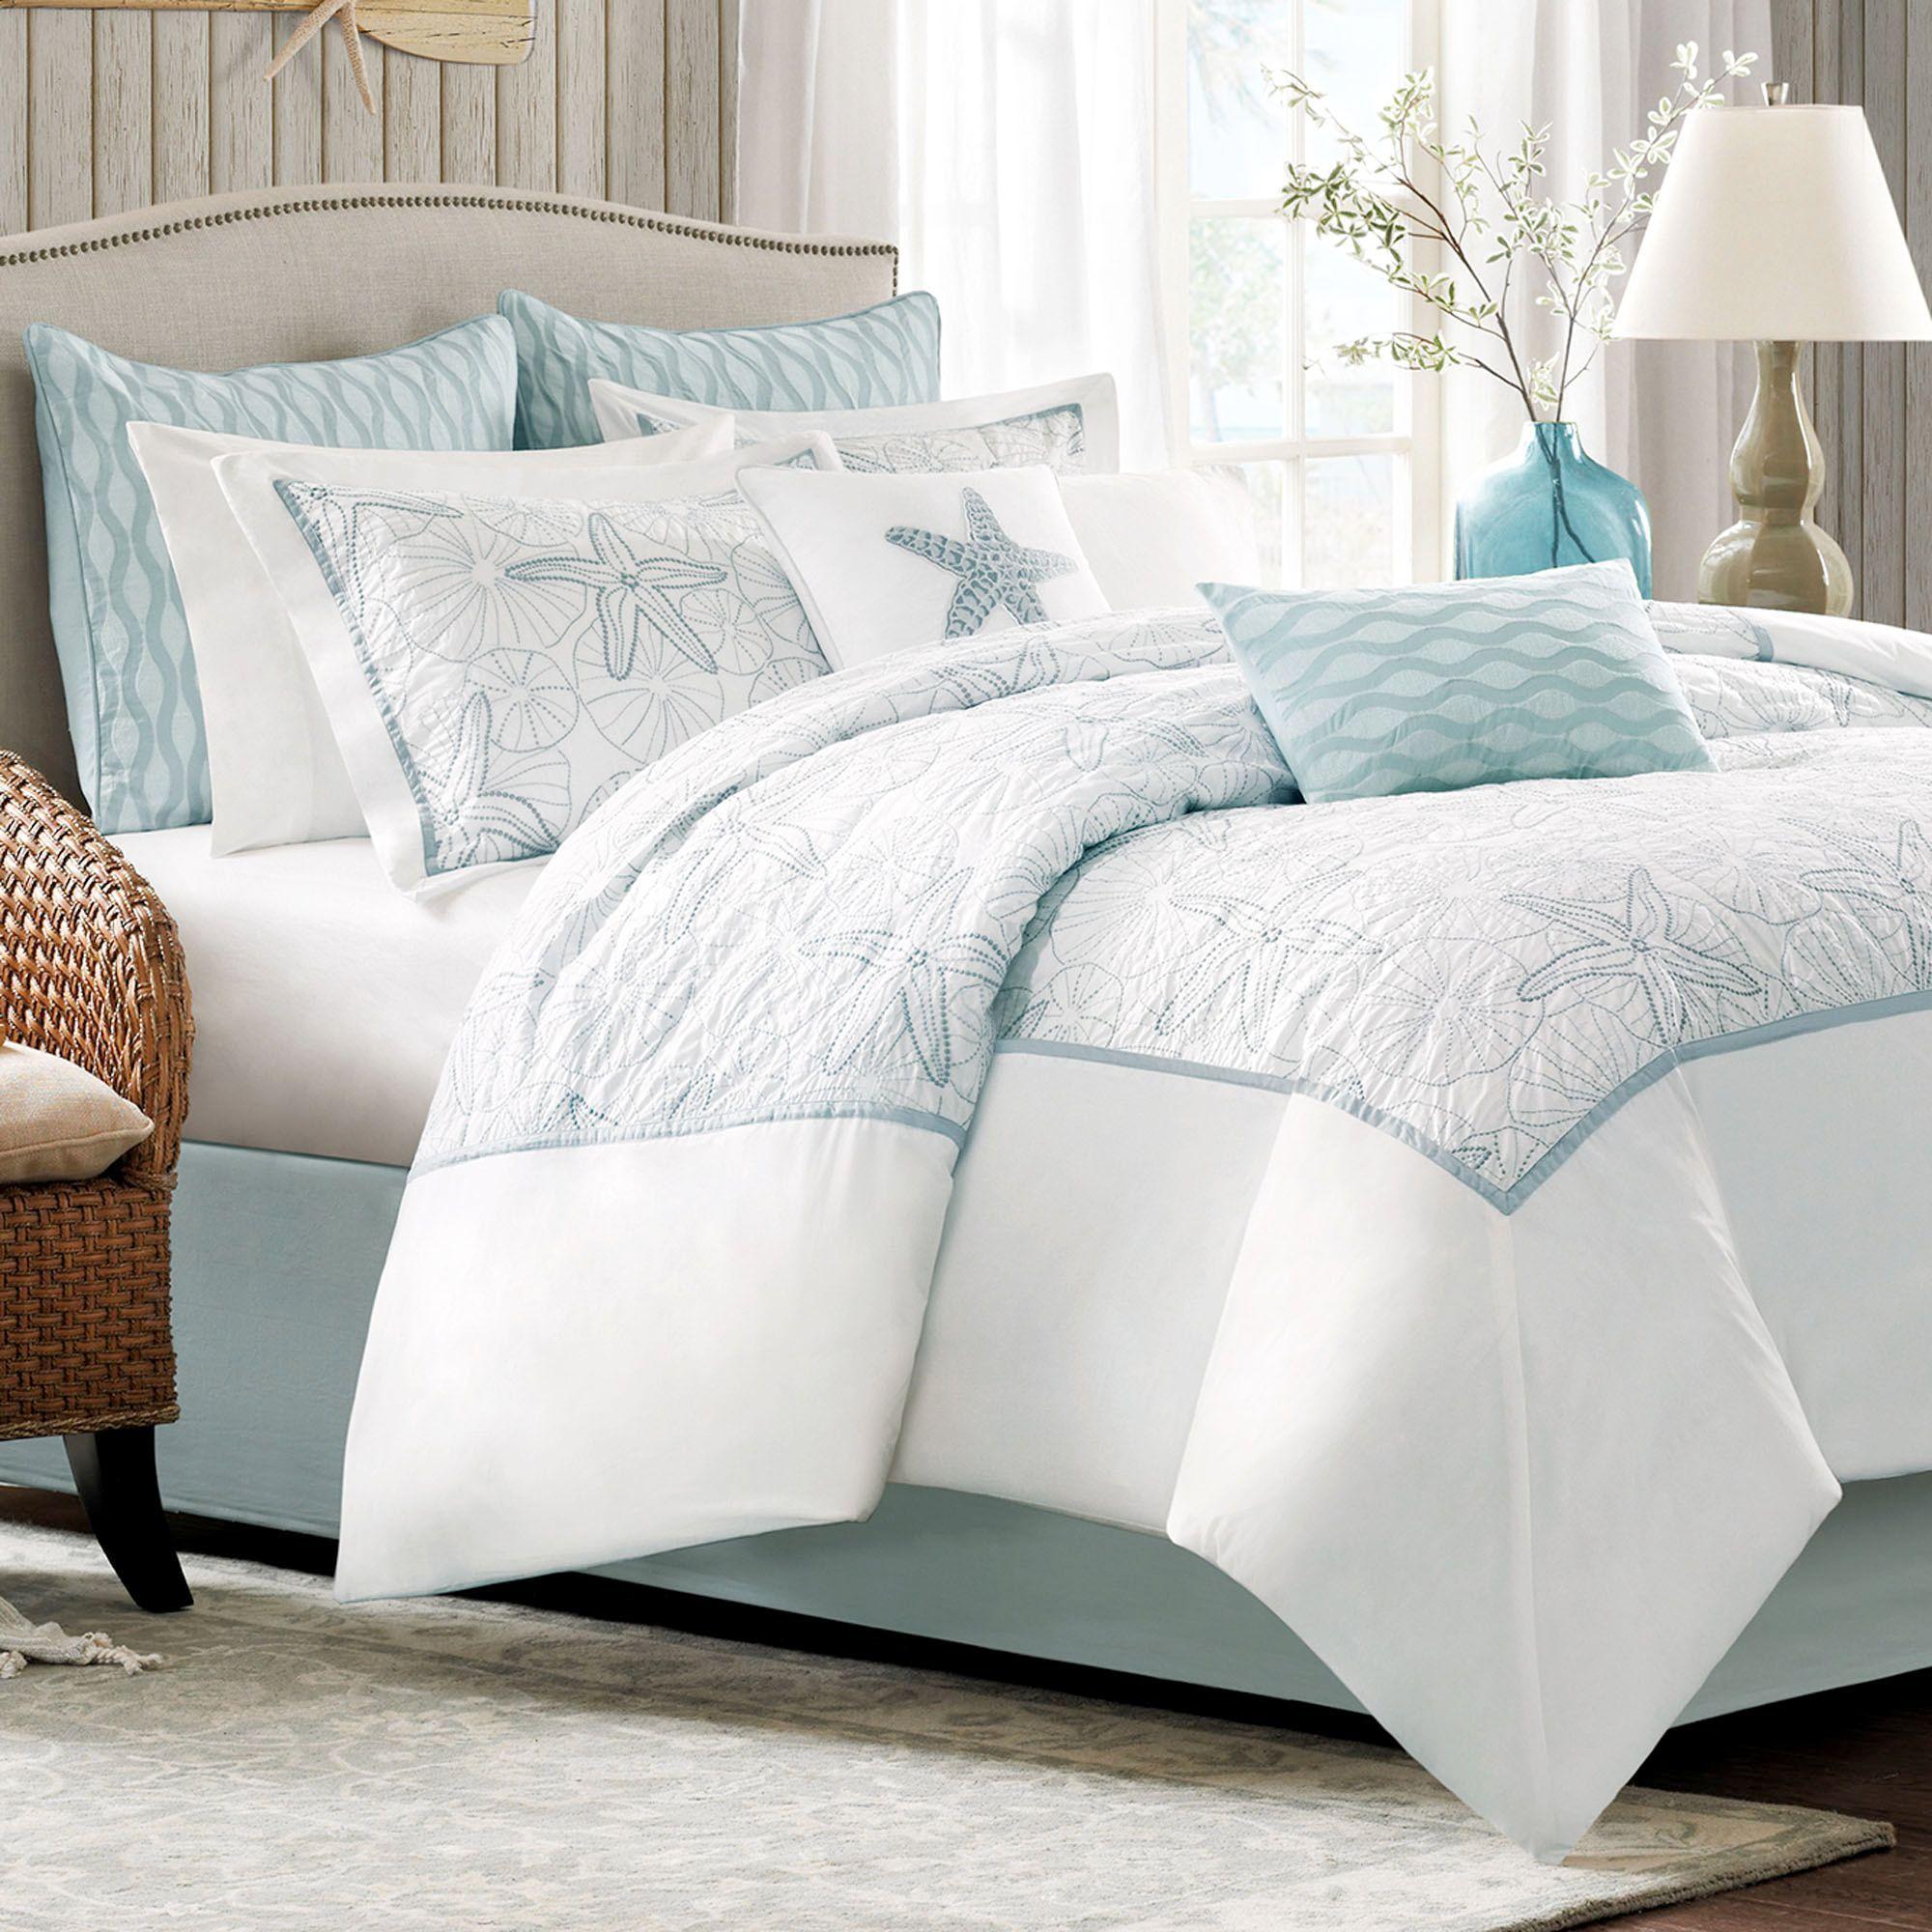 Maya Bay Embroidered Coastal Comforter Bedding Comforter